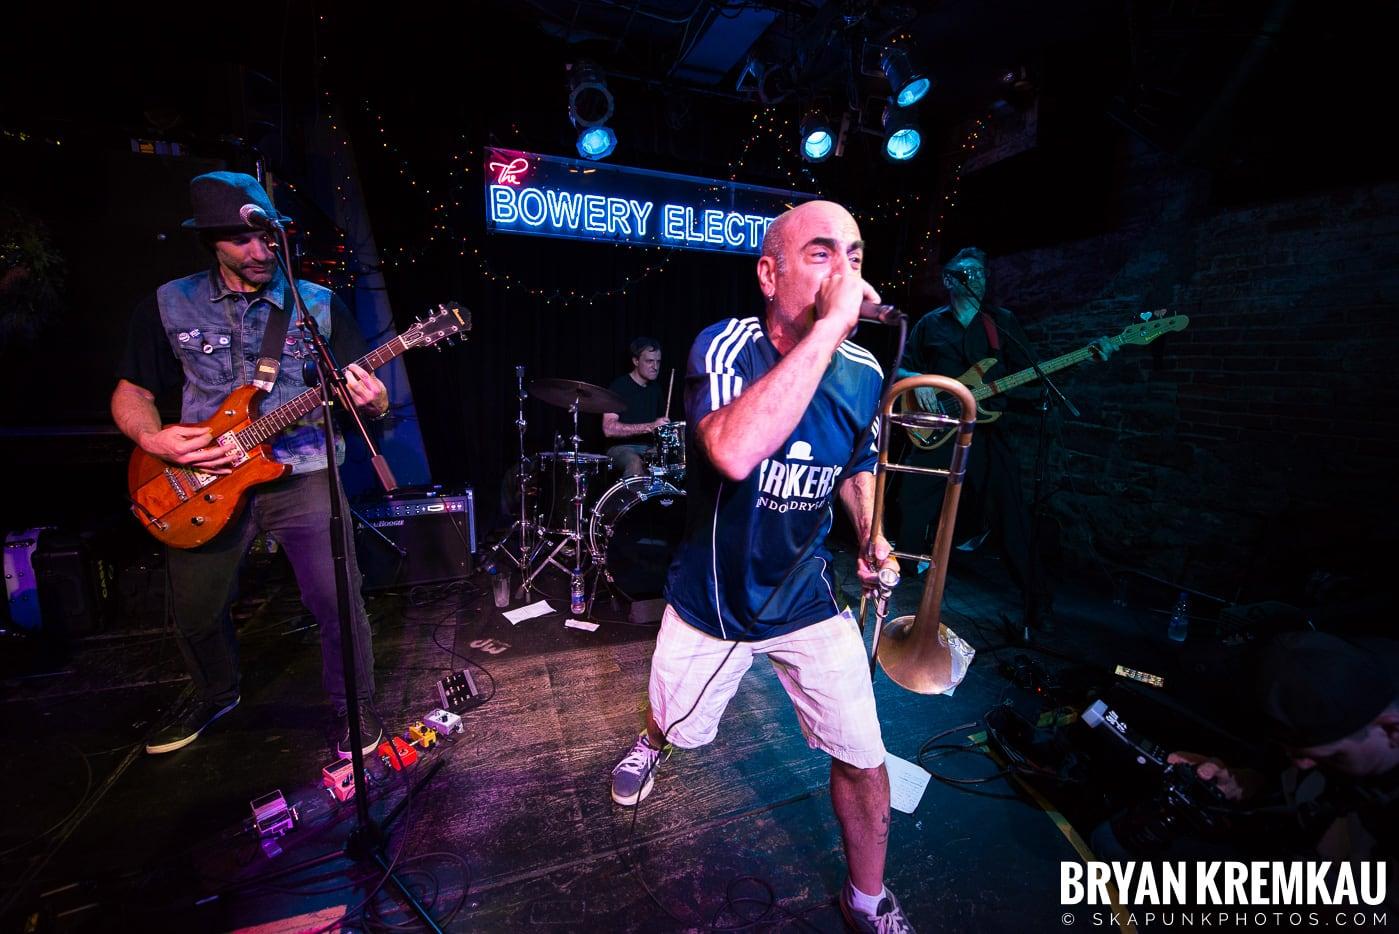 Cenzo @ Bowery Electric, NYC - 11.17.18 (6)